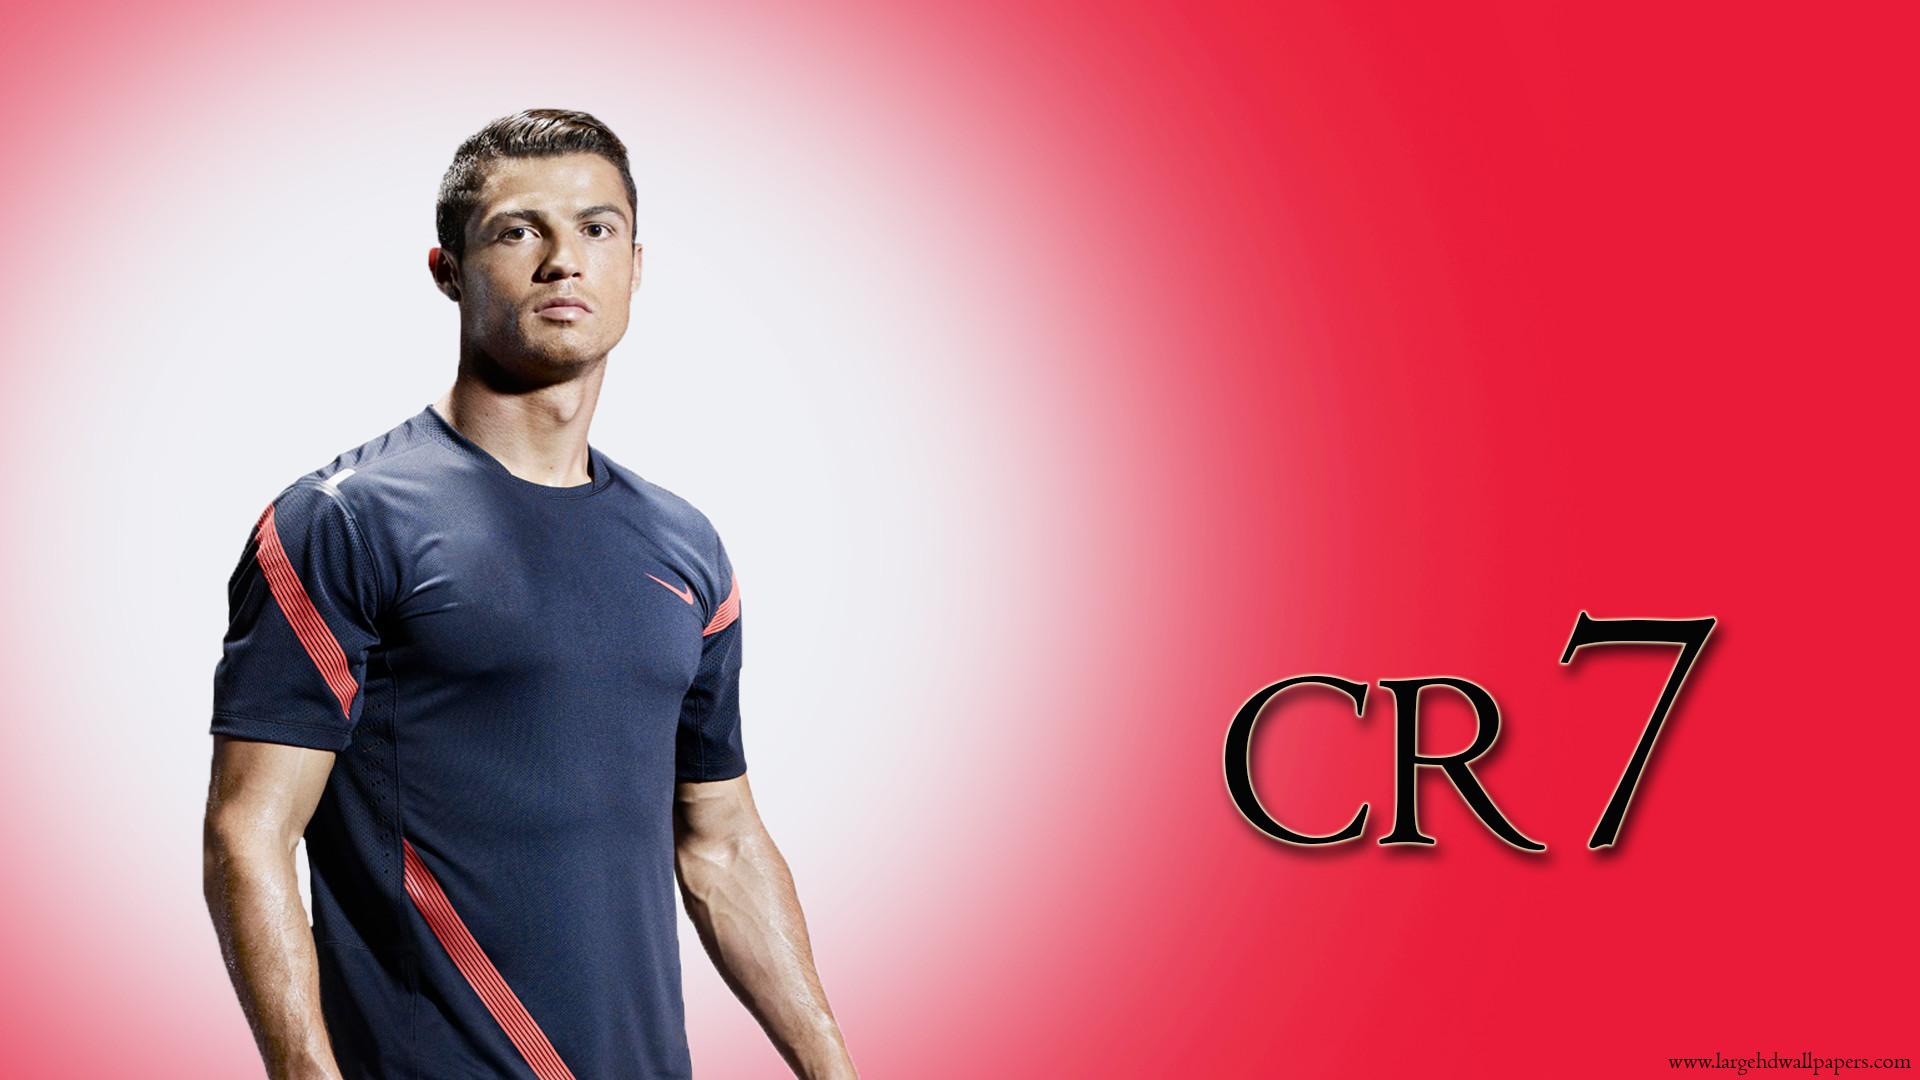 Cristiano Ronaldo CR7 Full HD Images